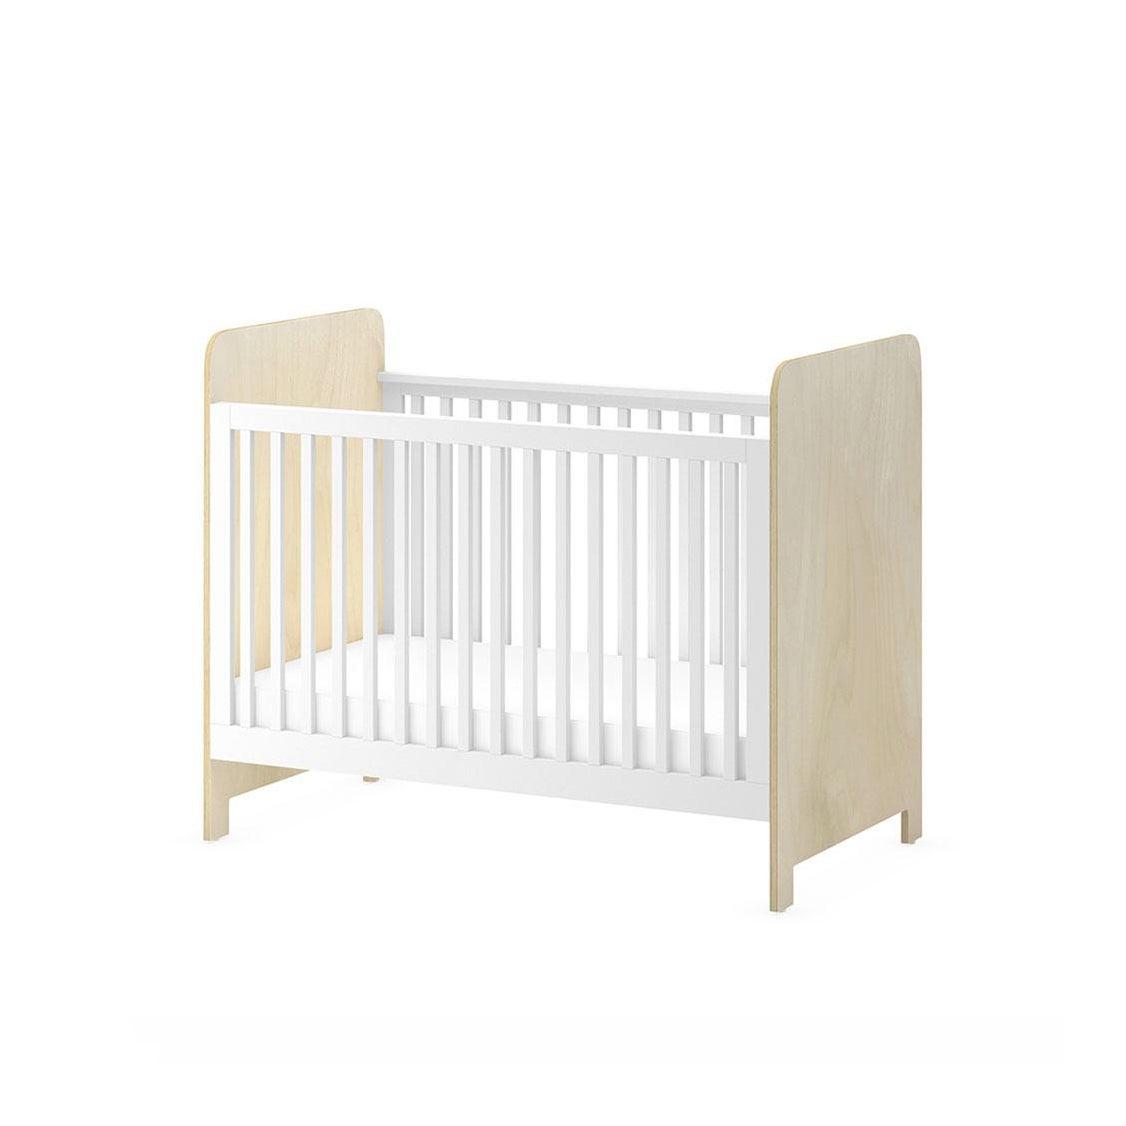 The-Best-Baby-Crib-Option-Studio-Duc-Juno-Crib